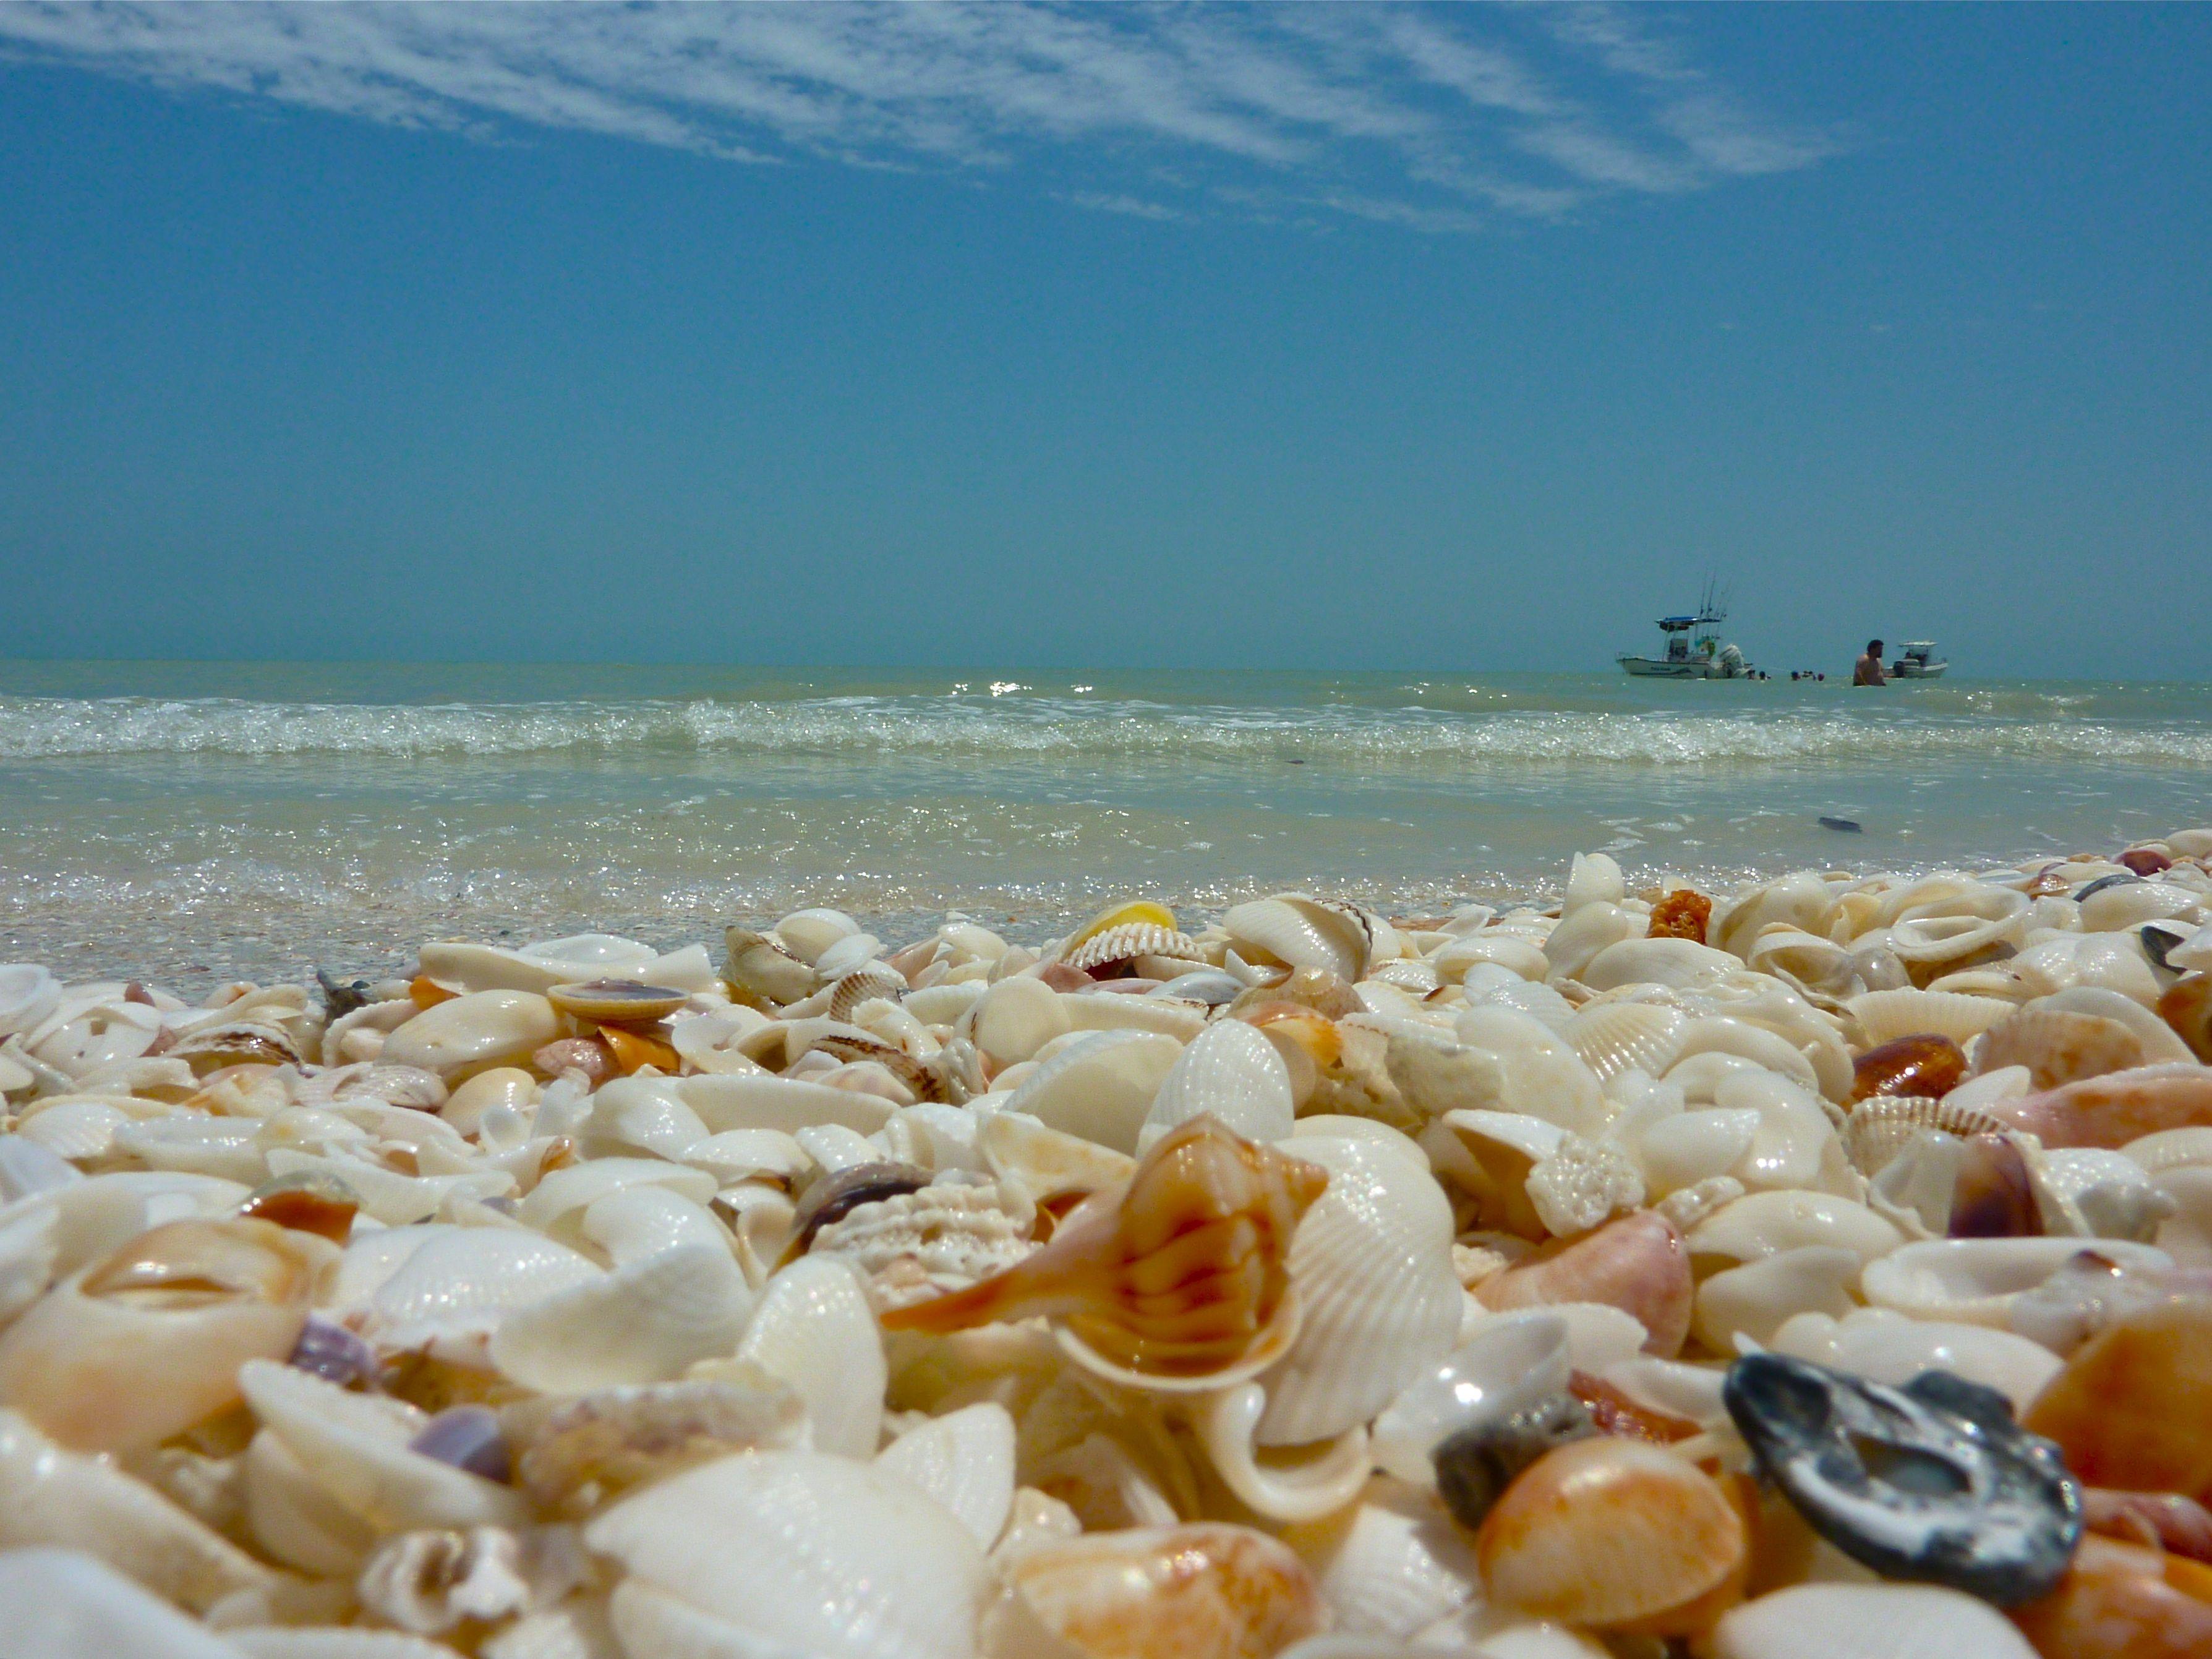 Sanibel Island Fl: 40 Photos Of Sanibel Island, Florida: Thousands Of Exotic